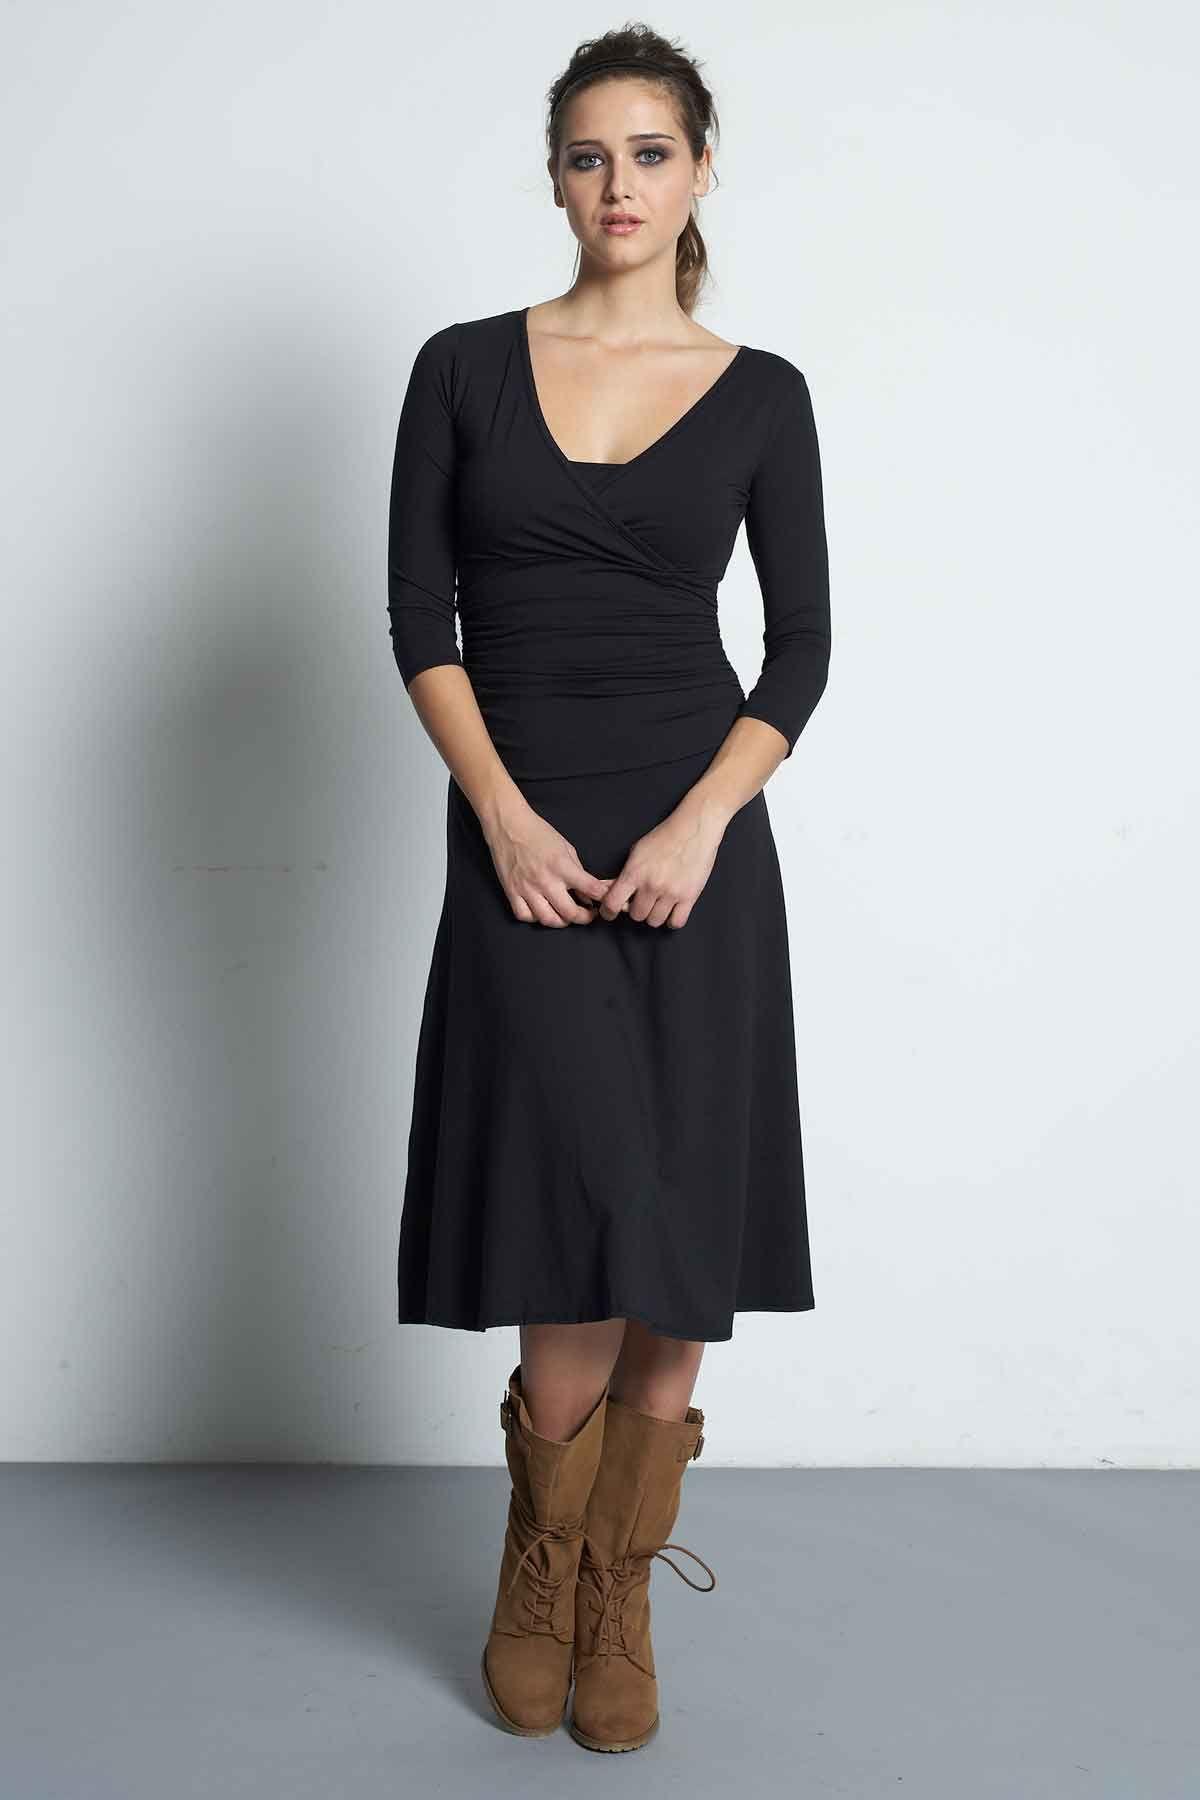 ca73421525bf2 Mothers En Vogue Dana 3/4 Sleeved Nursing Dress, Black - Izzy's Mum Breastfeeding  Clothing